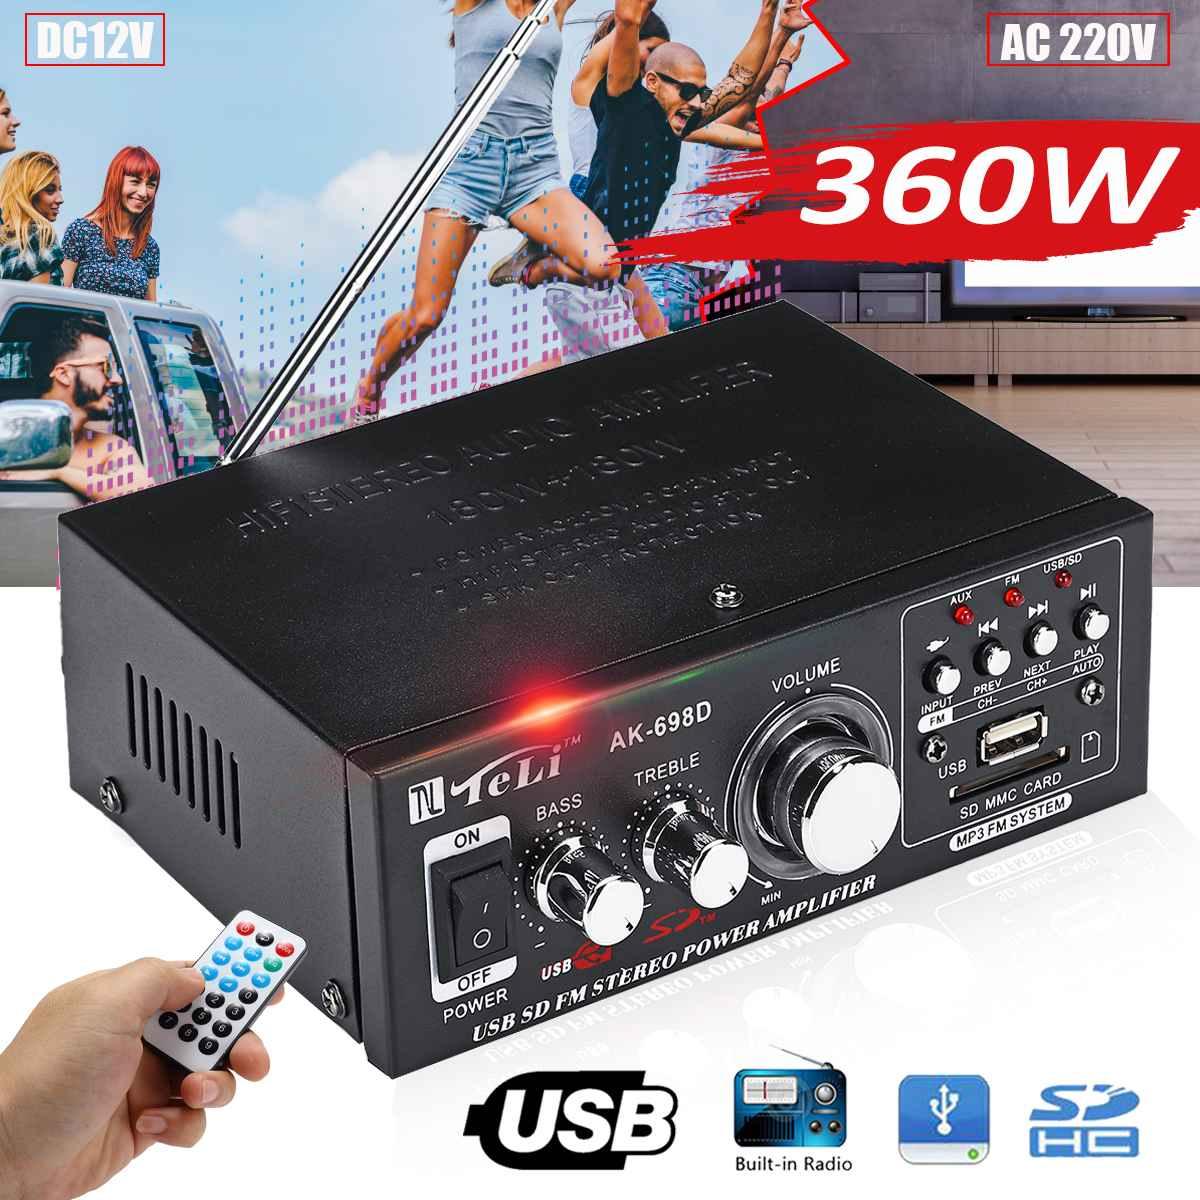 12V/ 220V HIFI Audio Amplificador Stereo Power 360W Car Amplifier FM Radio 2CH USB MP3 Home Theater Amplifiers w/ Remote Control